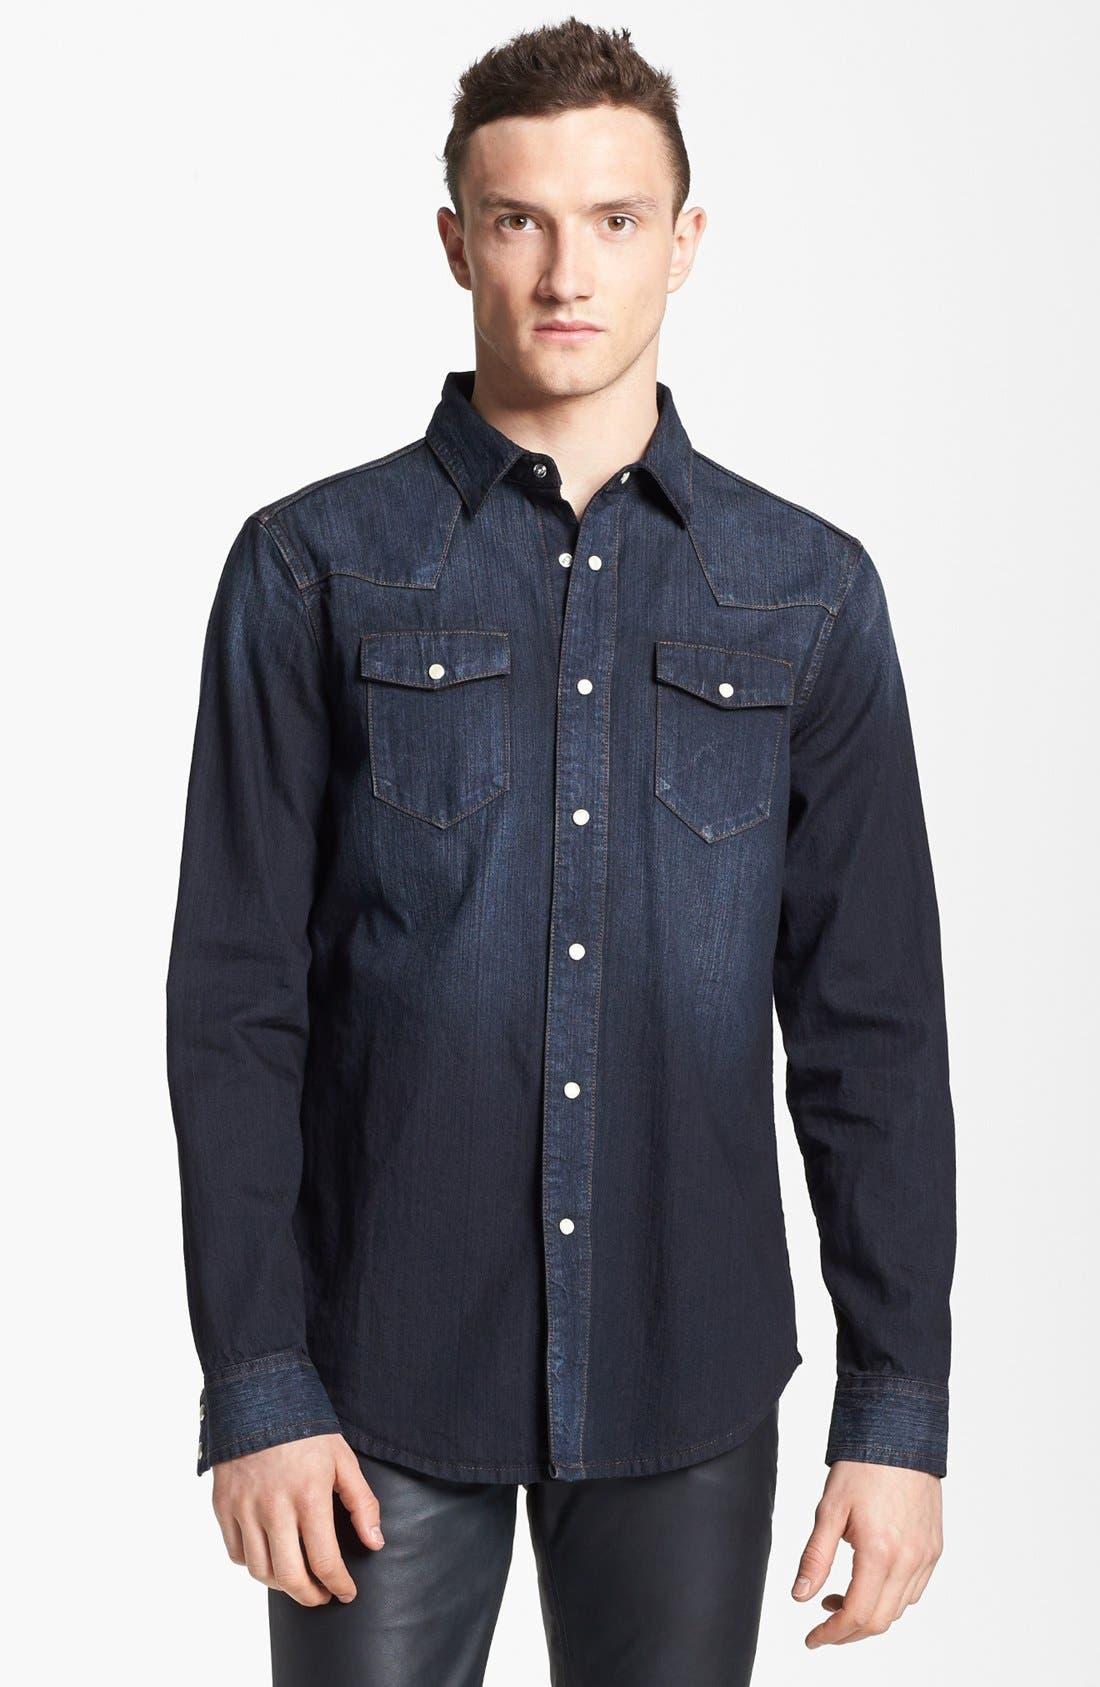 Alternate Image 1 Selected - BLK DNM Western Denim Shirt